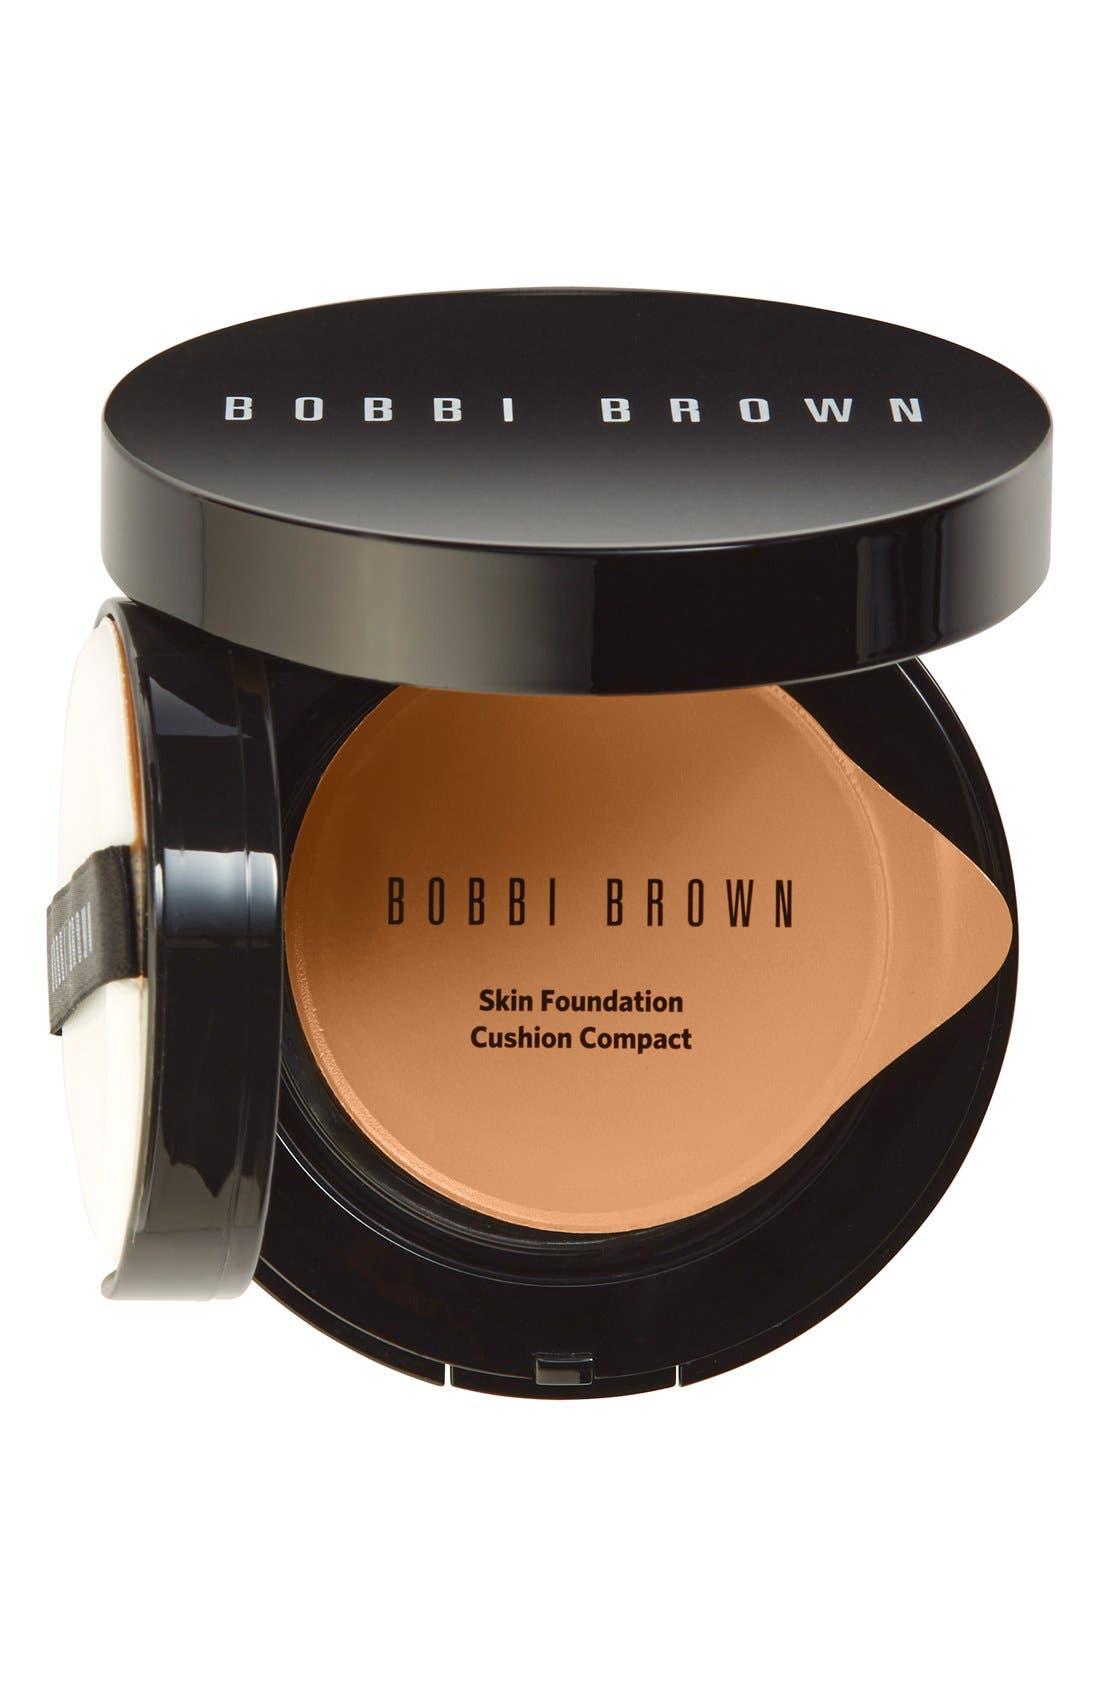 Bobbi Brown Skin Foundation Cushion Compact SPF 35